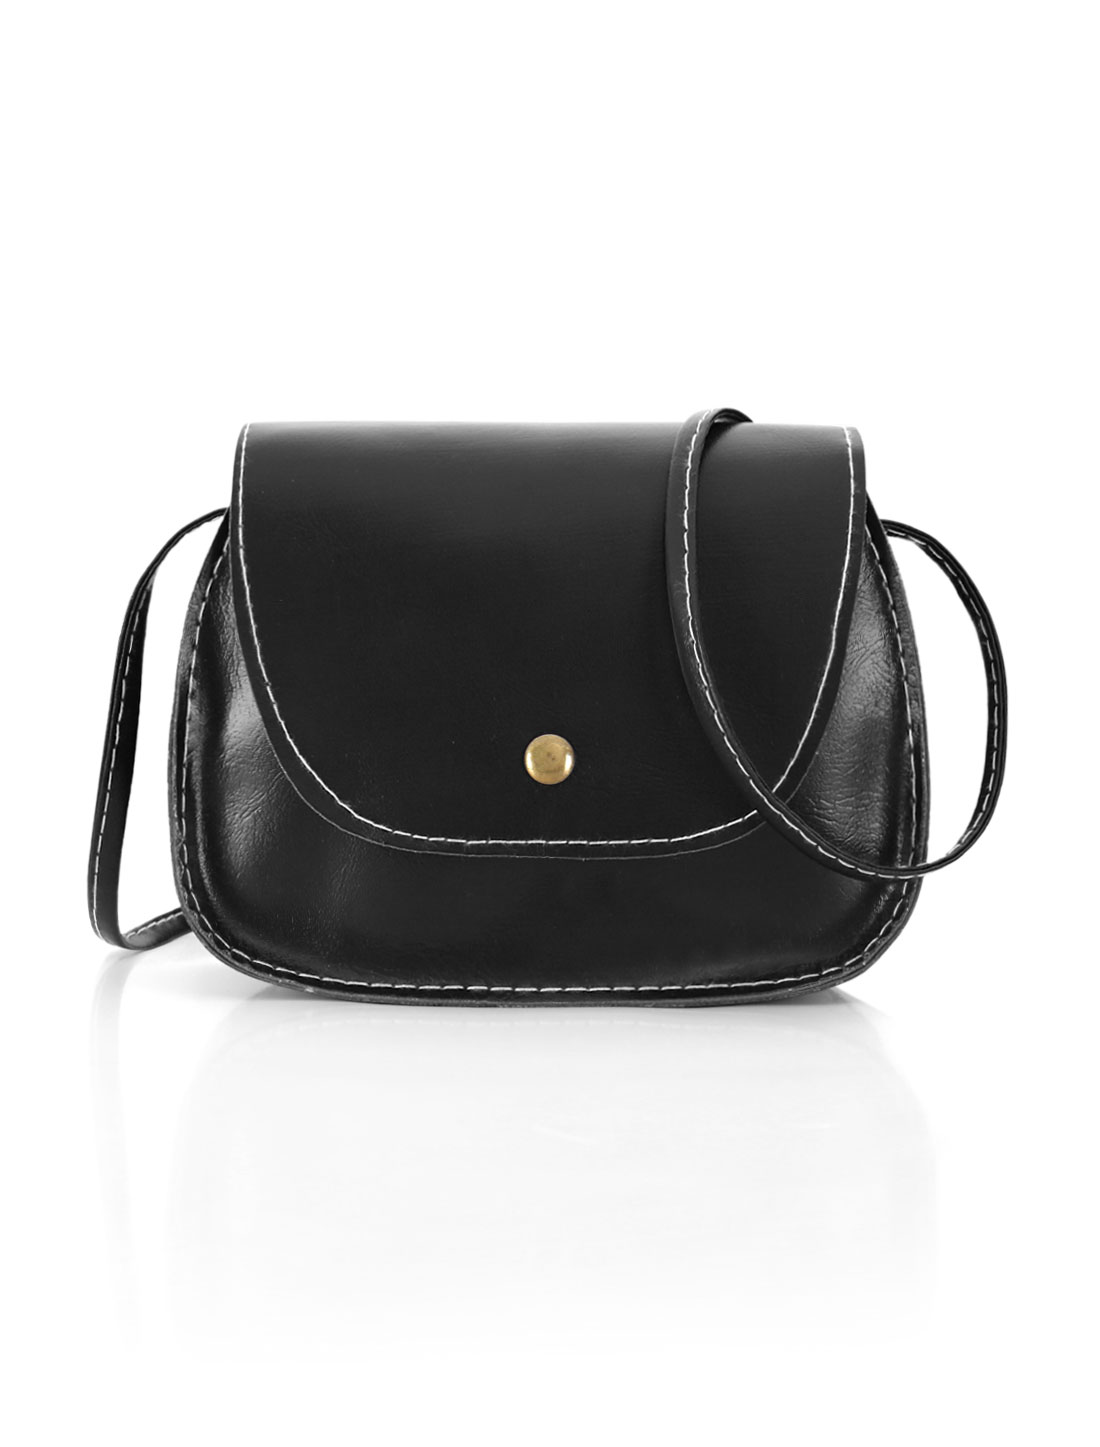 Women Detachable Strap Snap-Magnetic Closure Crossbody Bag Black